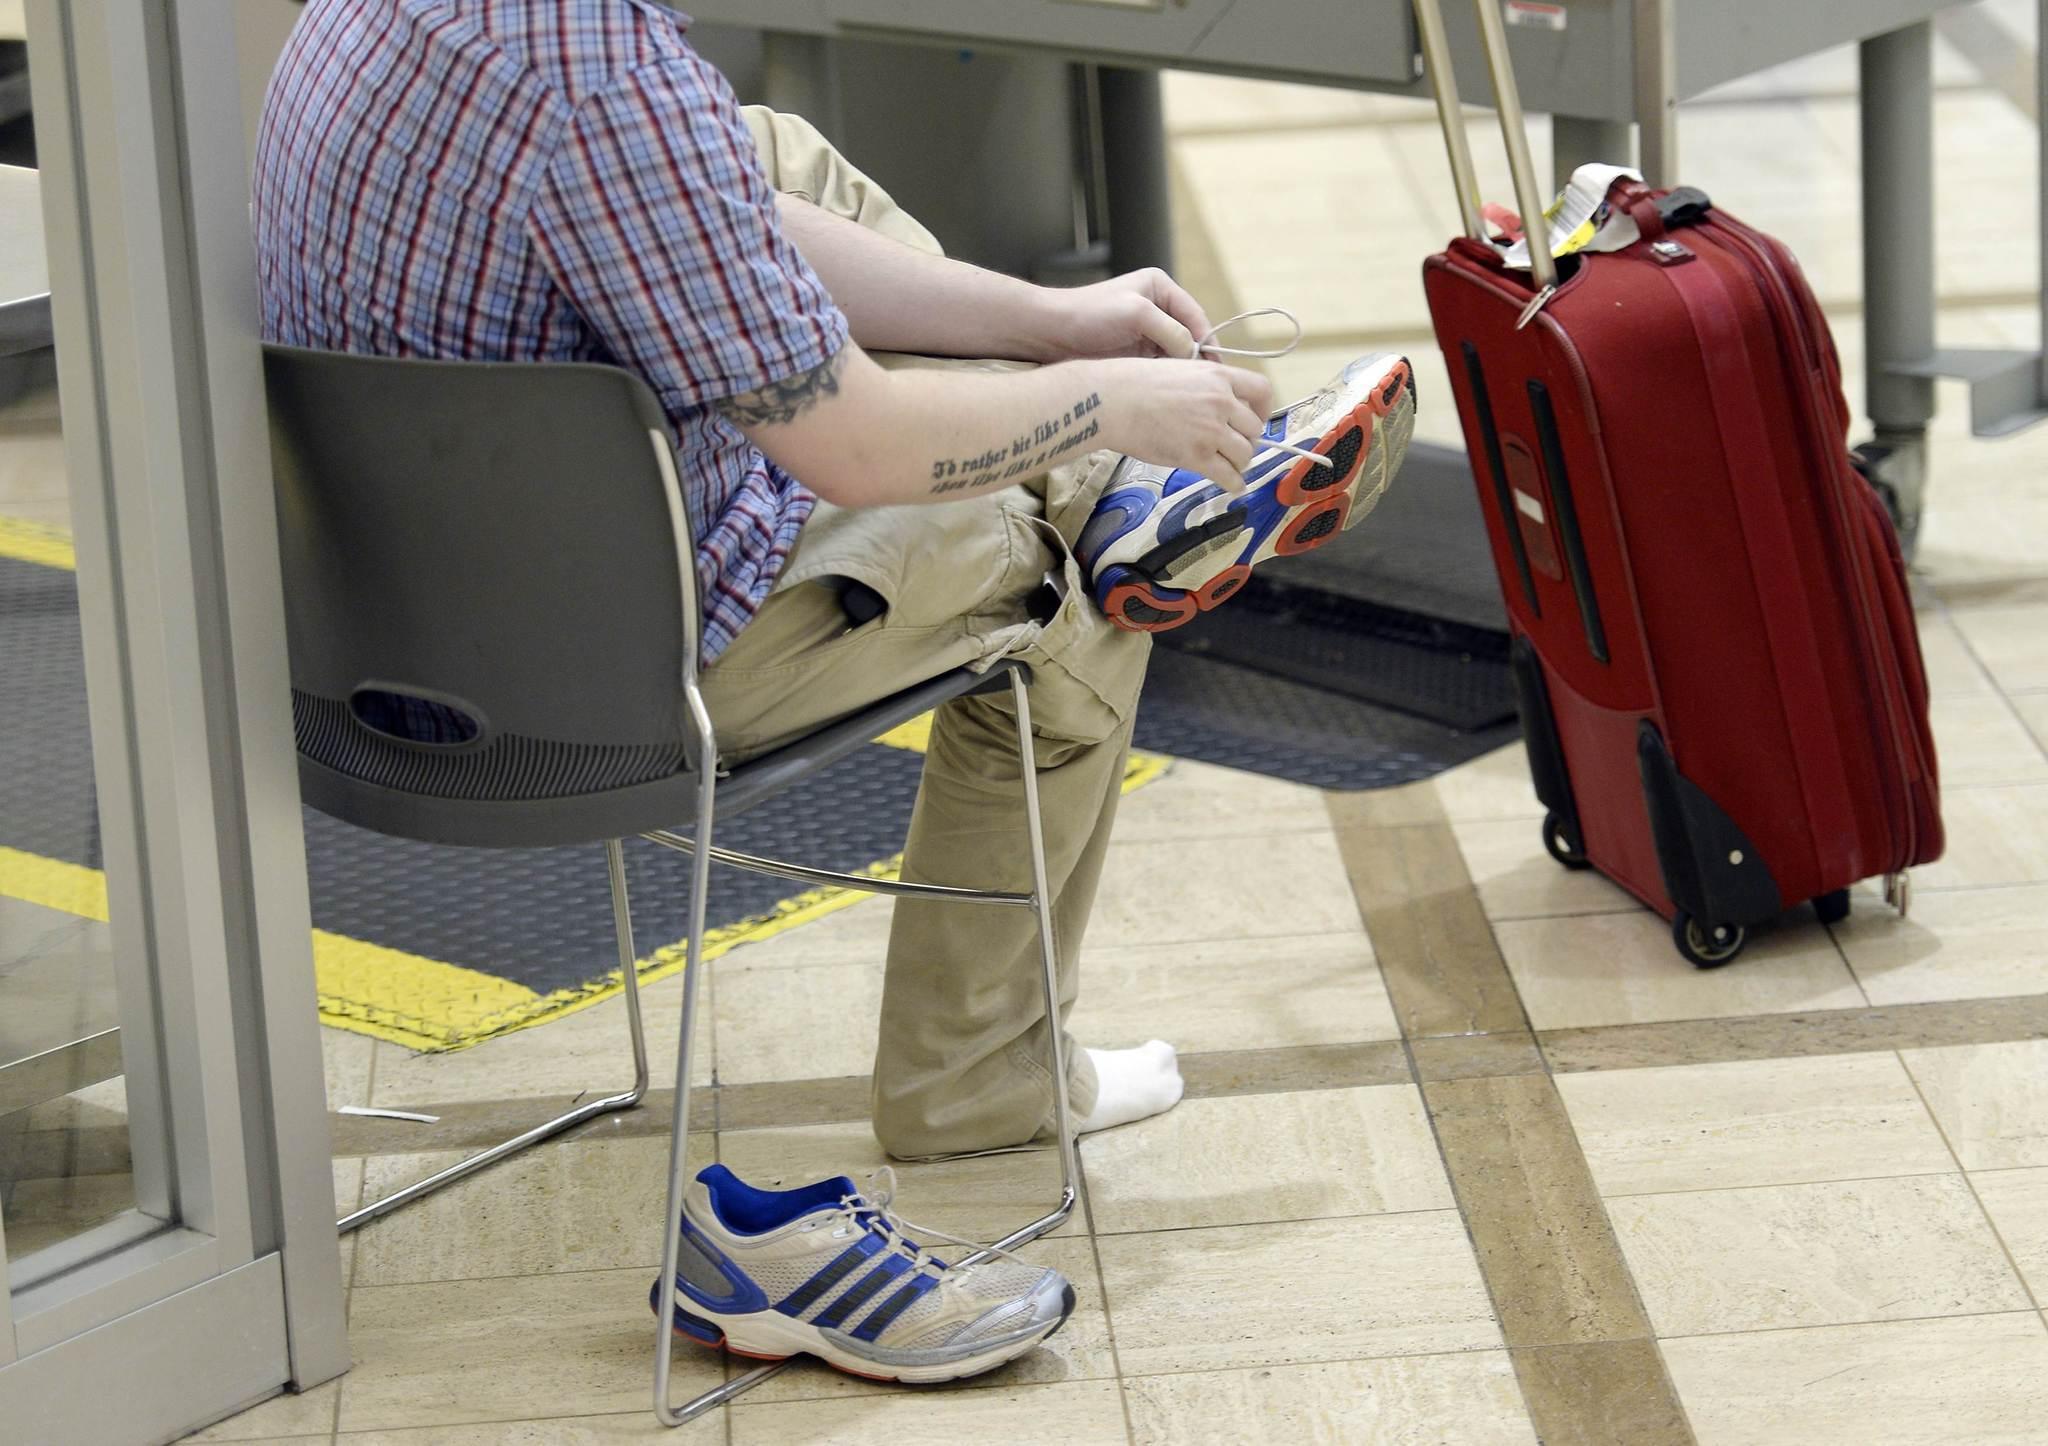 United Cracks Down On Carry On Bag Size Tribunedigital